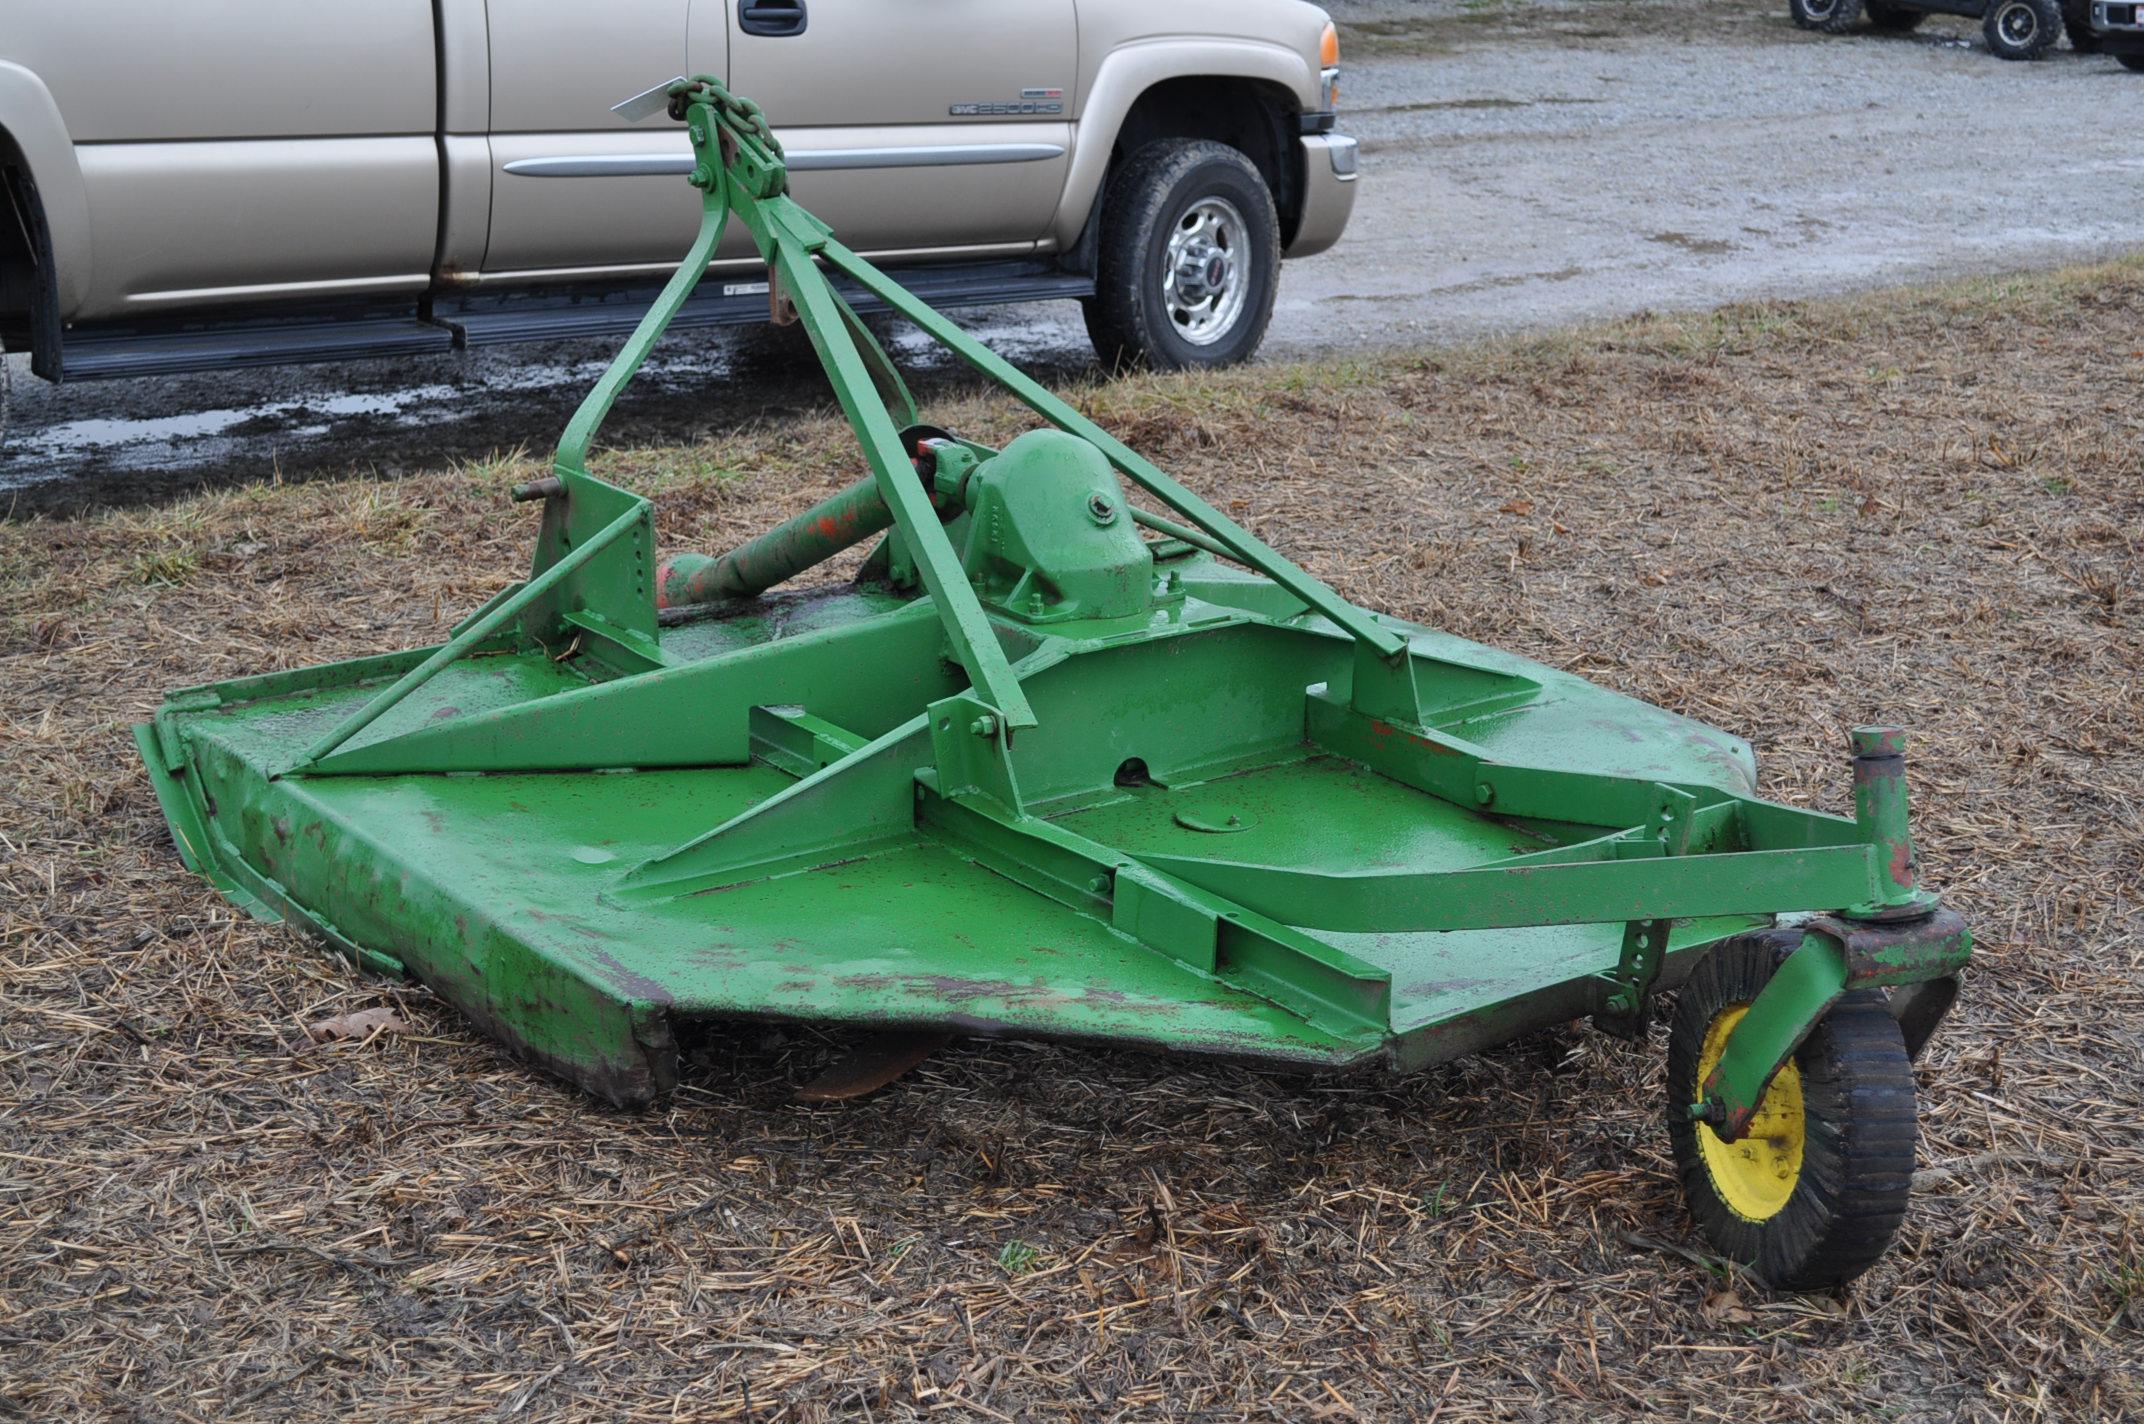 6' John Deere 3pt. rotary mower - Image 2 of 7